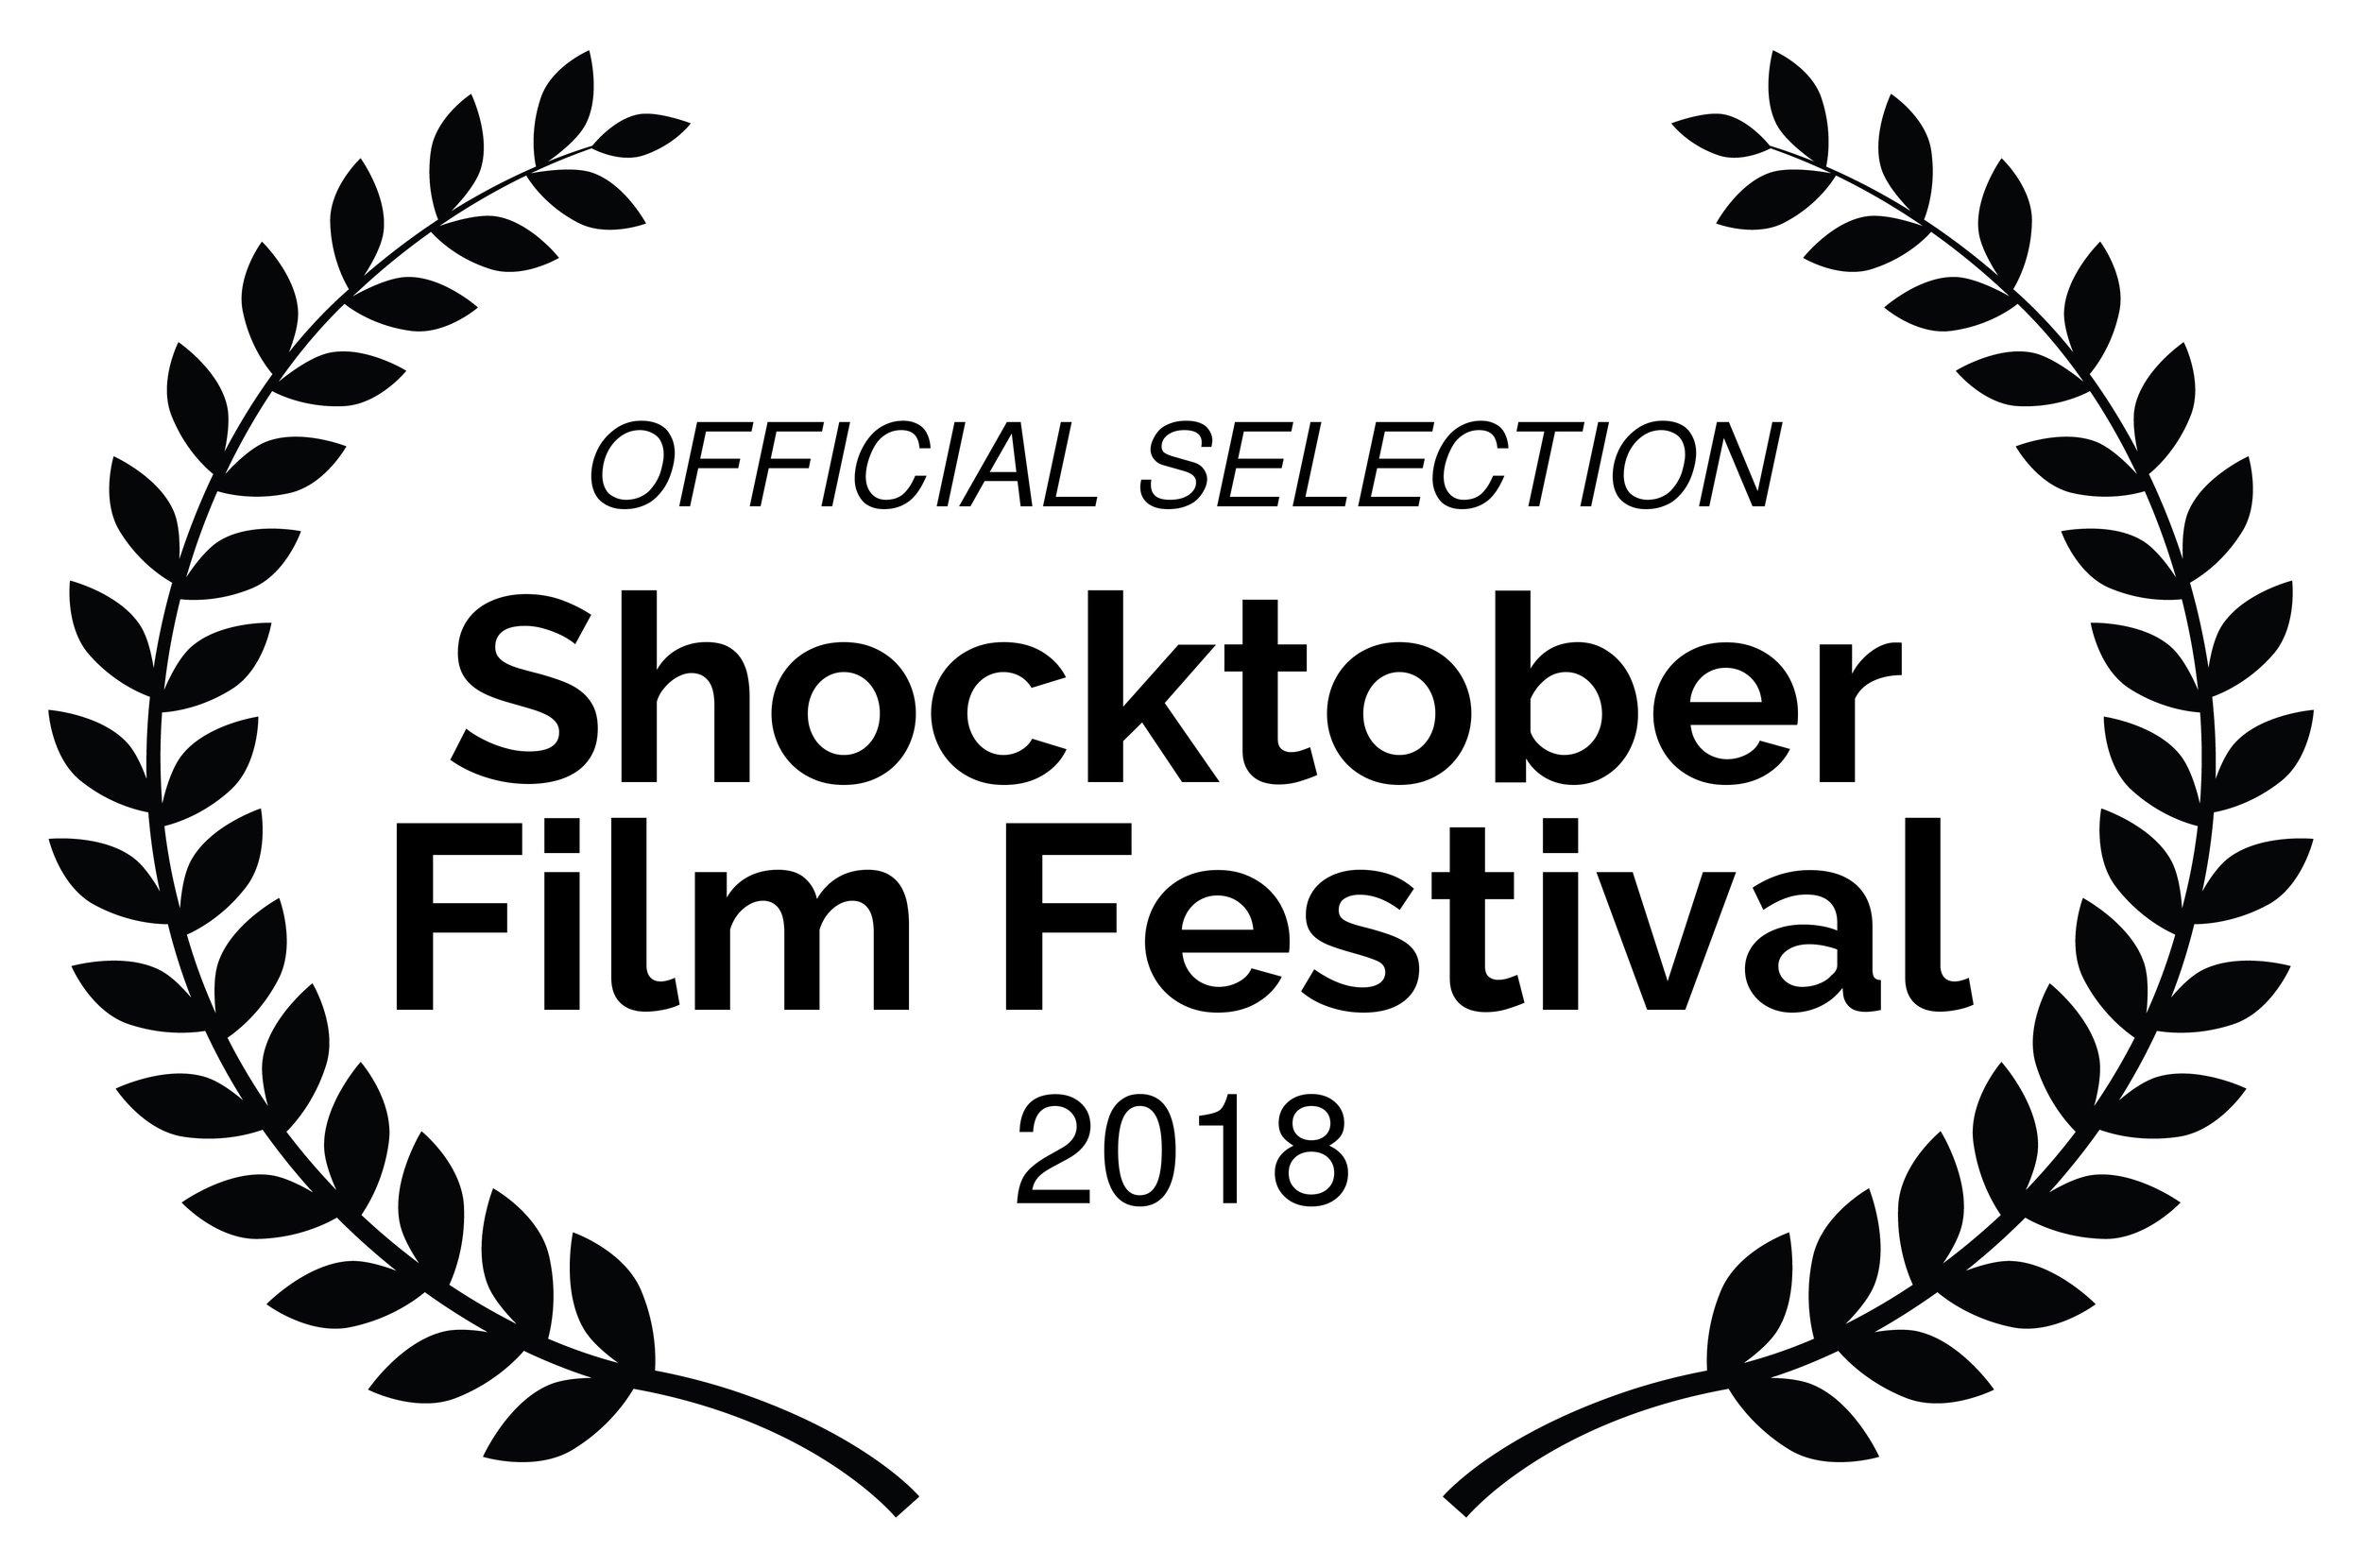 OFFICIALSELECTION-ShocktoberFilmFestival-2018.jpg